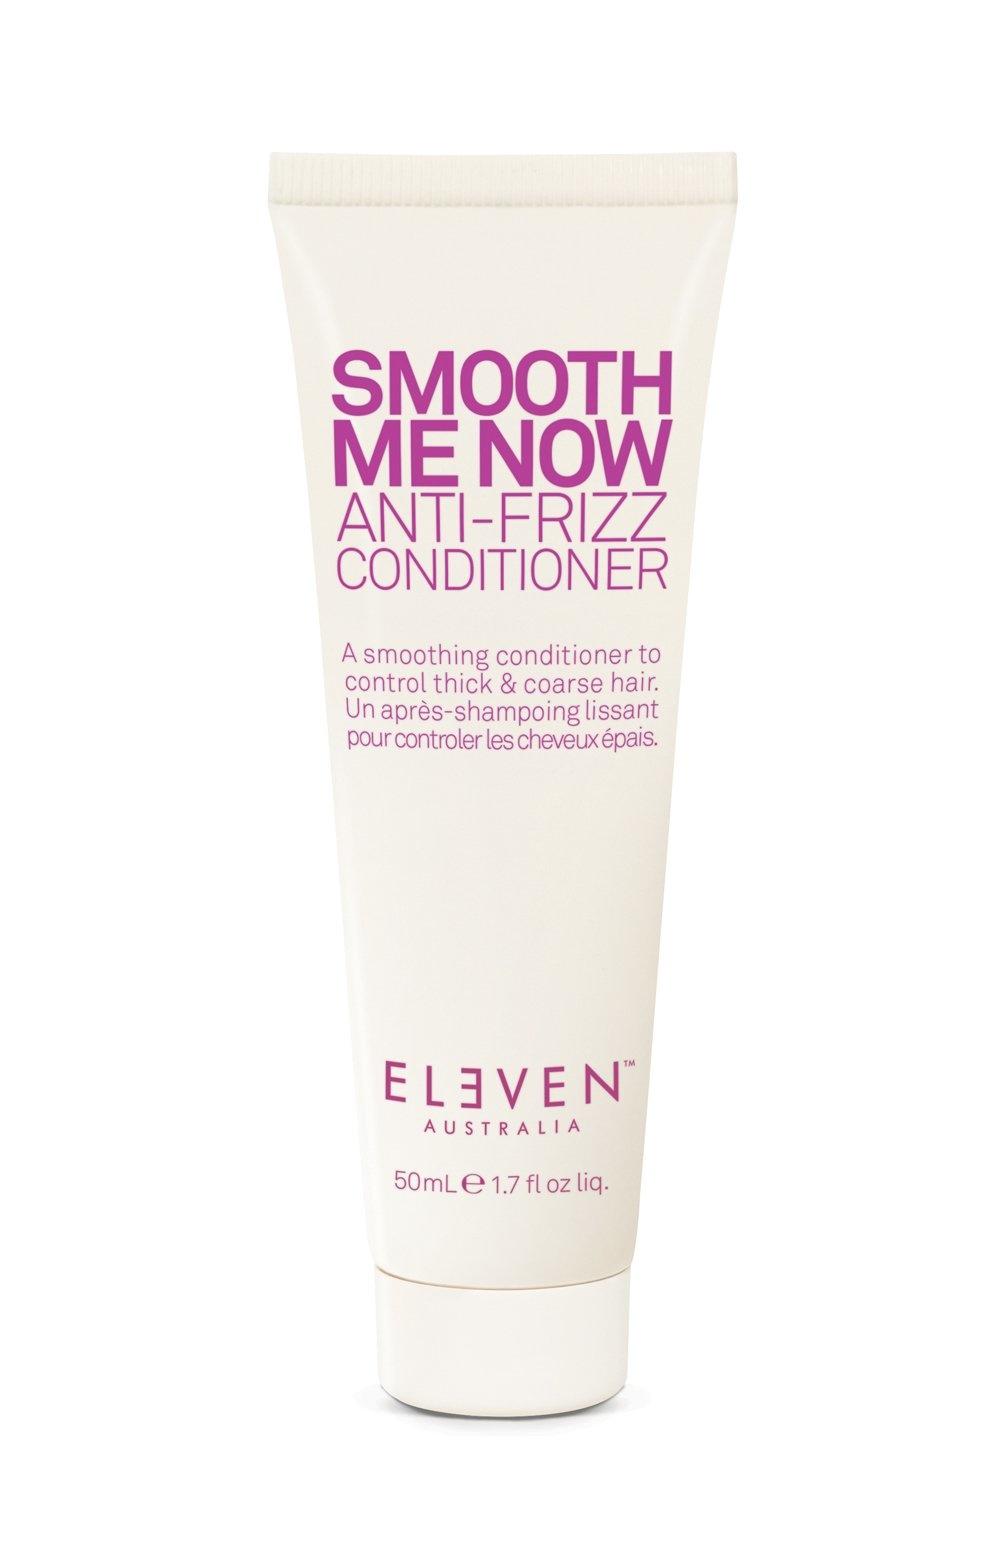 Eleven Australia Smooth Me Now Anti-Frizz Conditioner